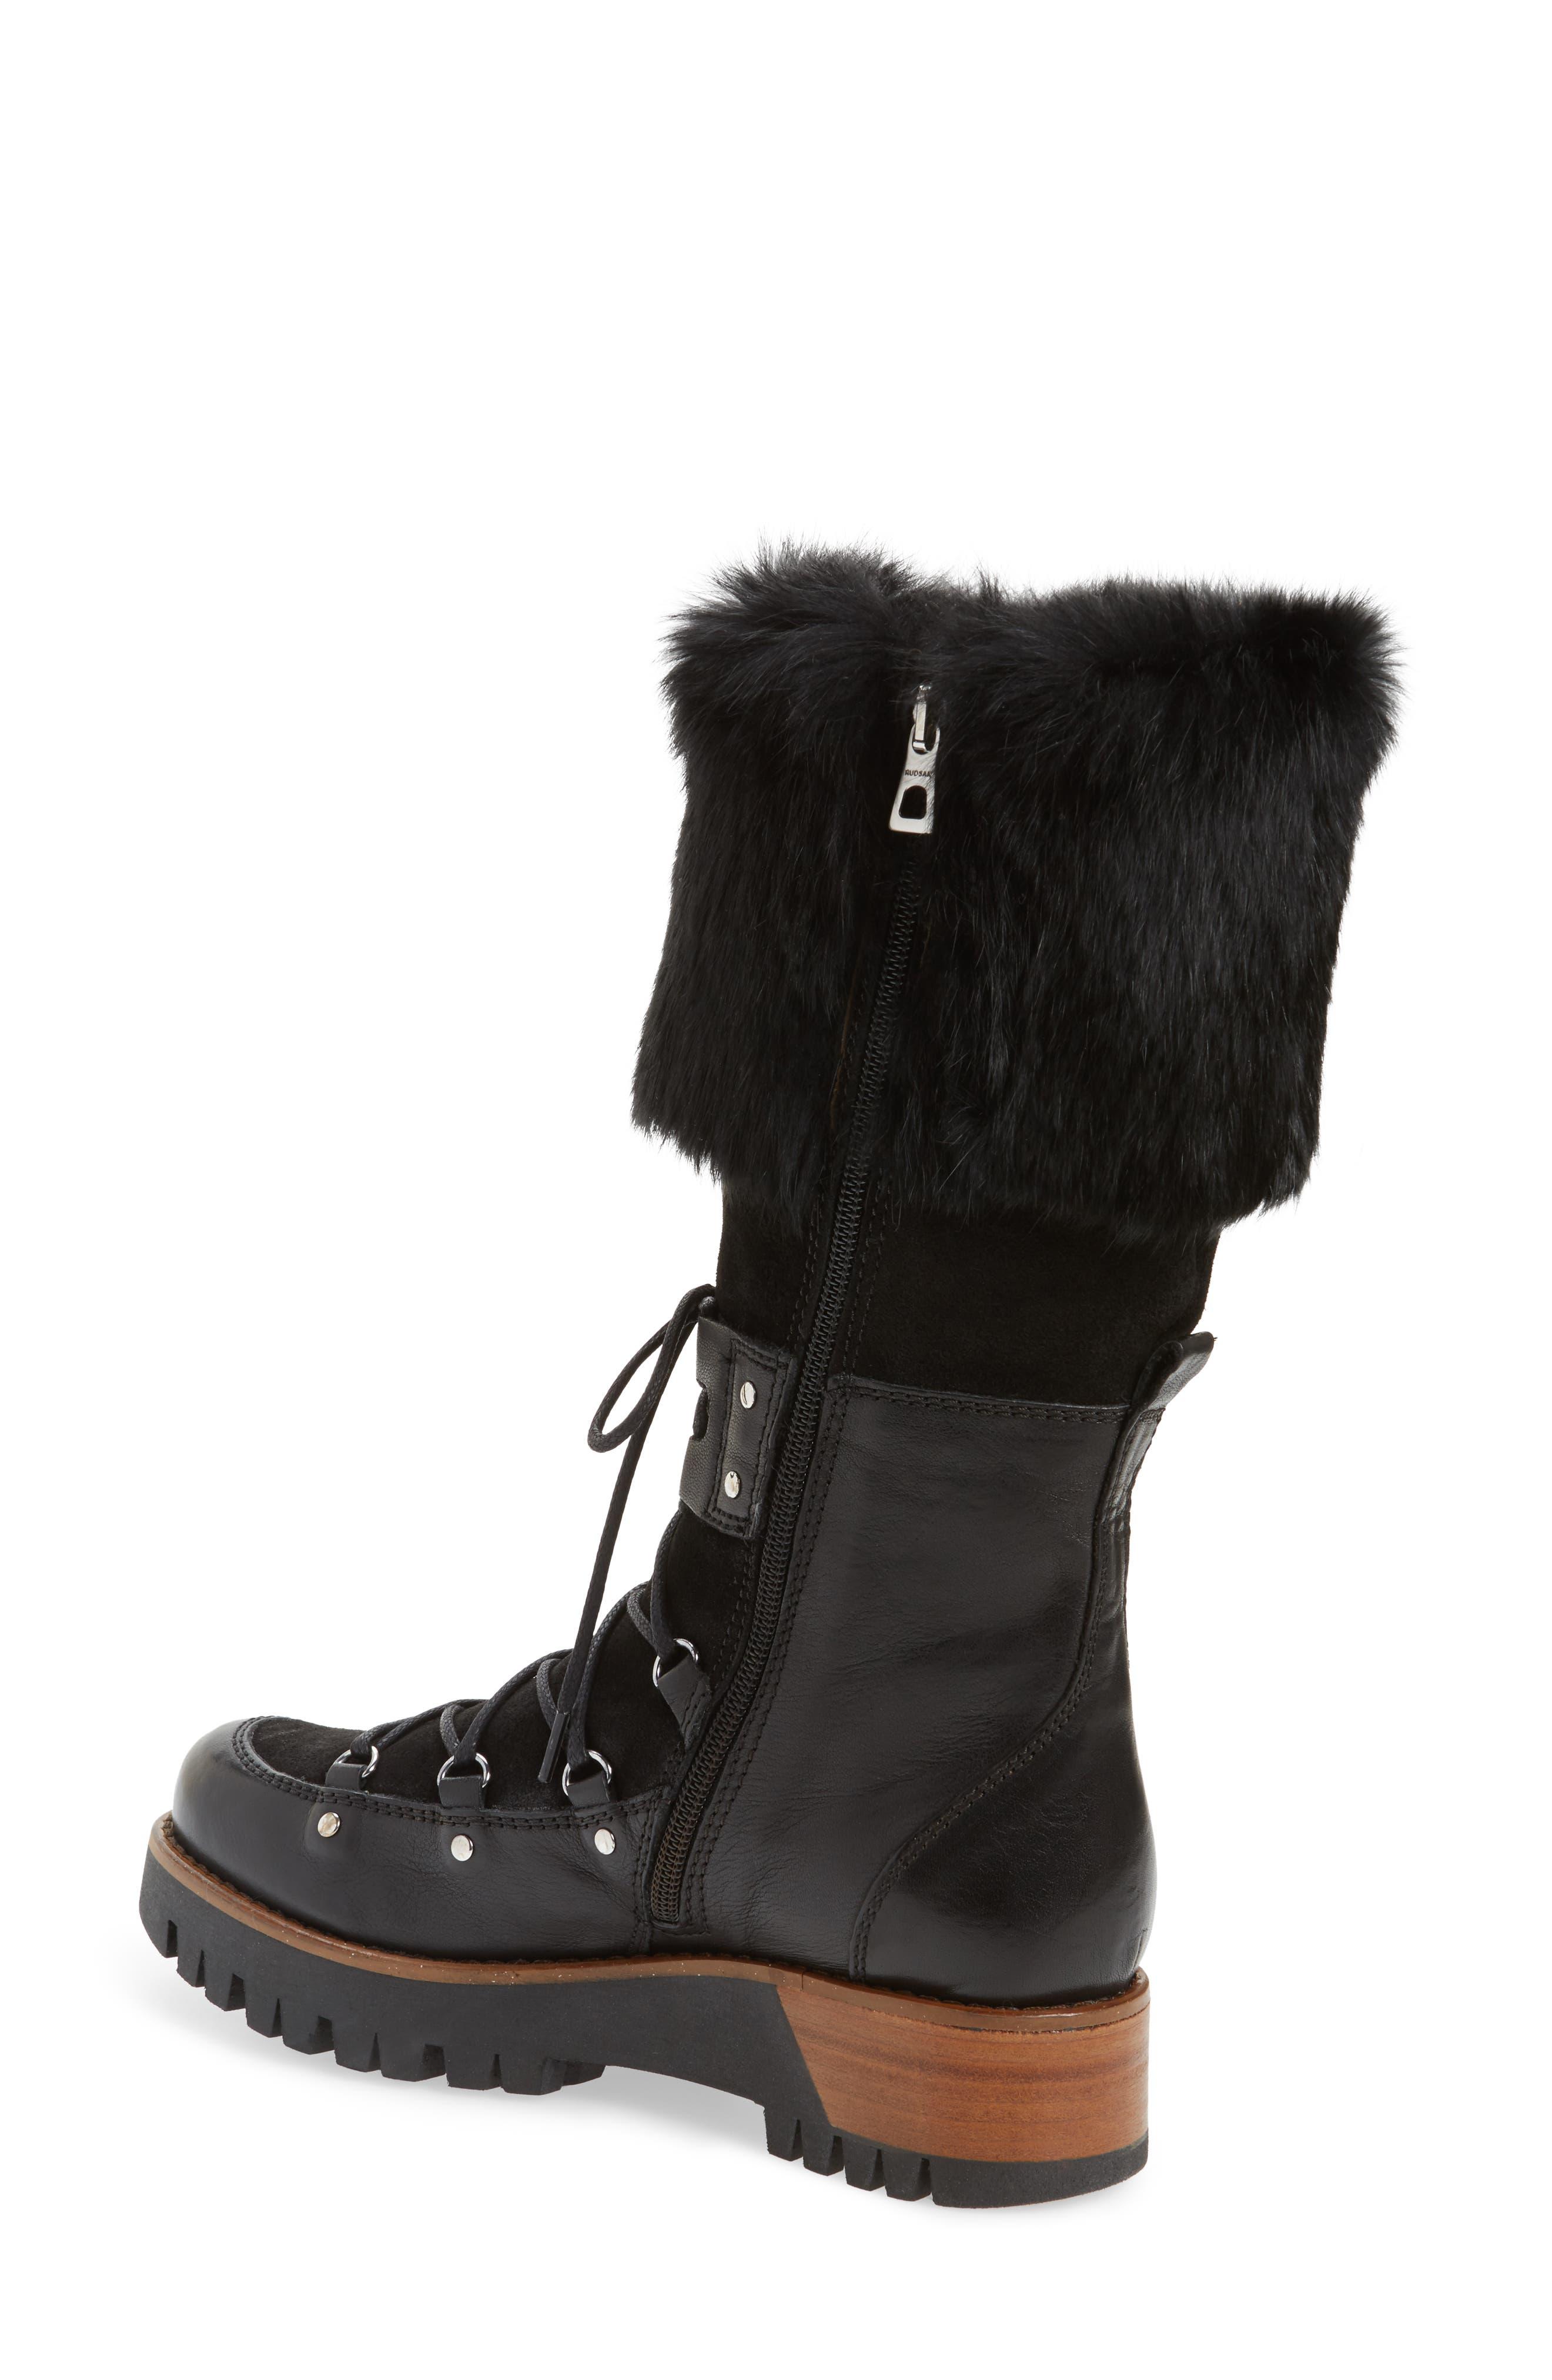 Tellurian Genuine Rabbit Fur Cuff Boot,                             Alternate thumbnail 2, color,                             Black Leather